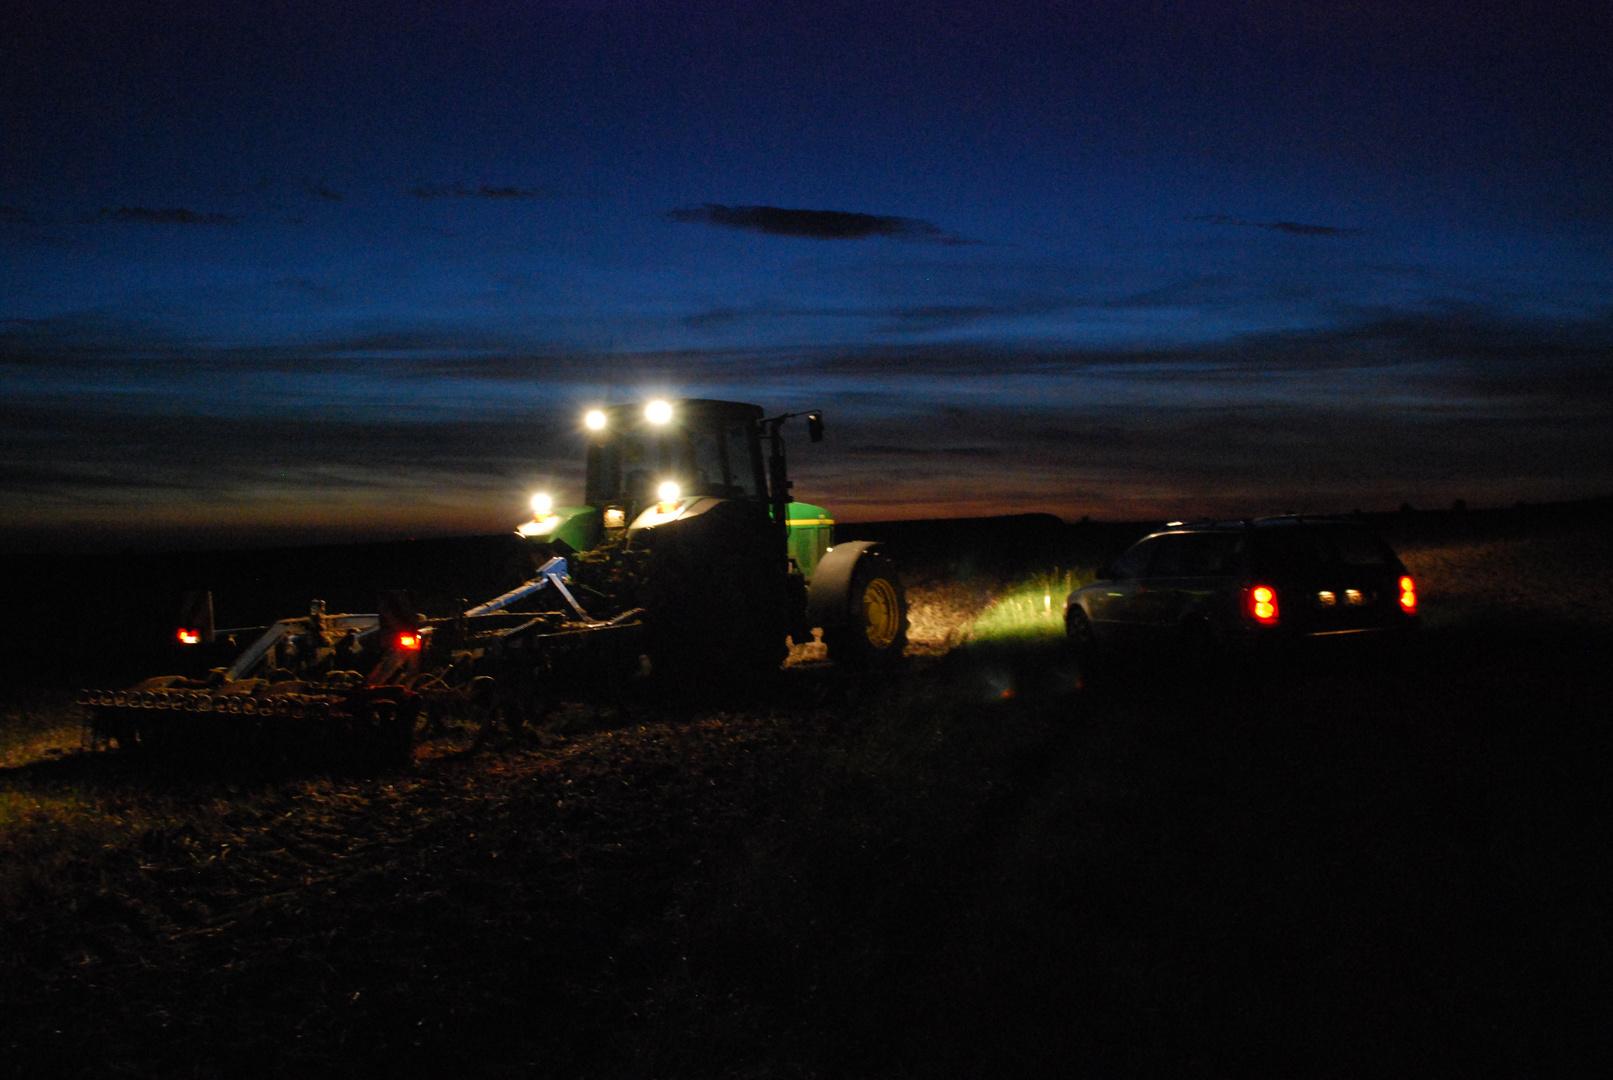 nachts auf dem Feld